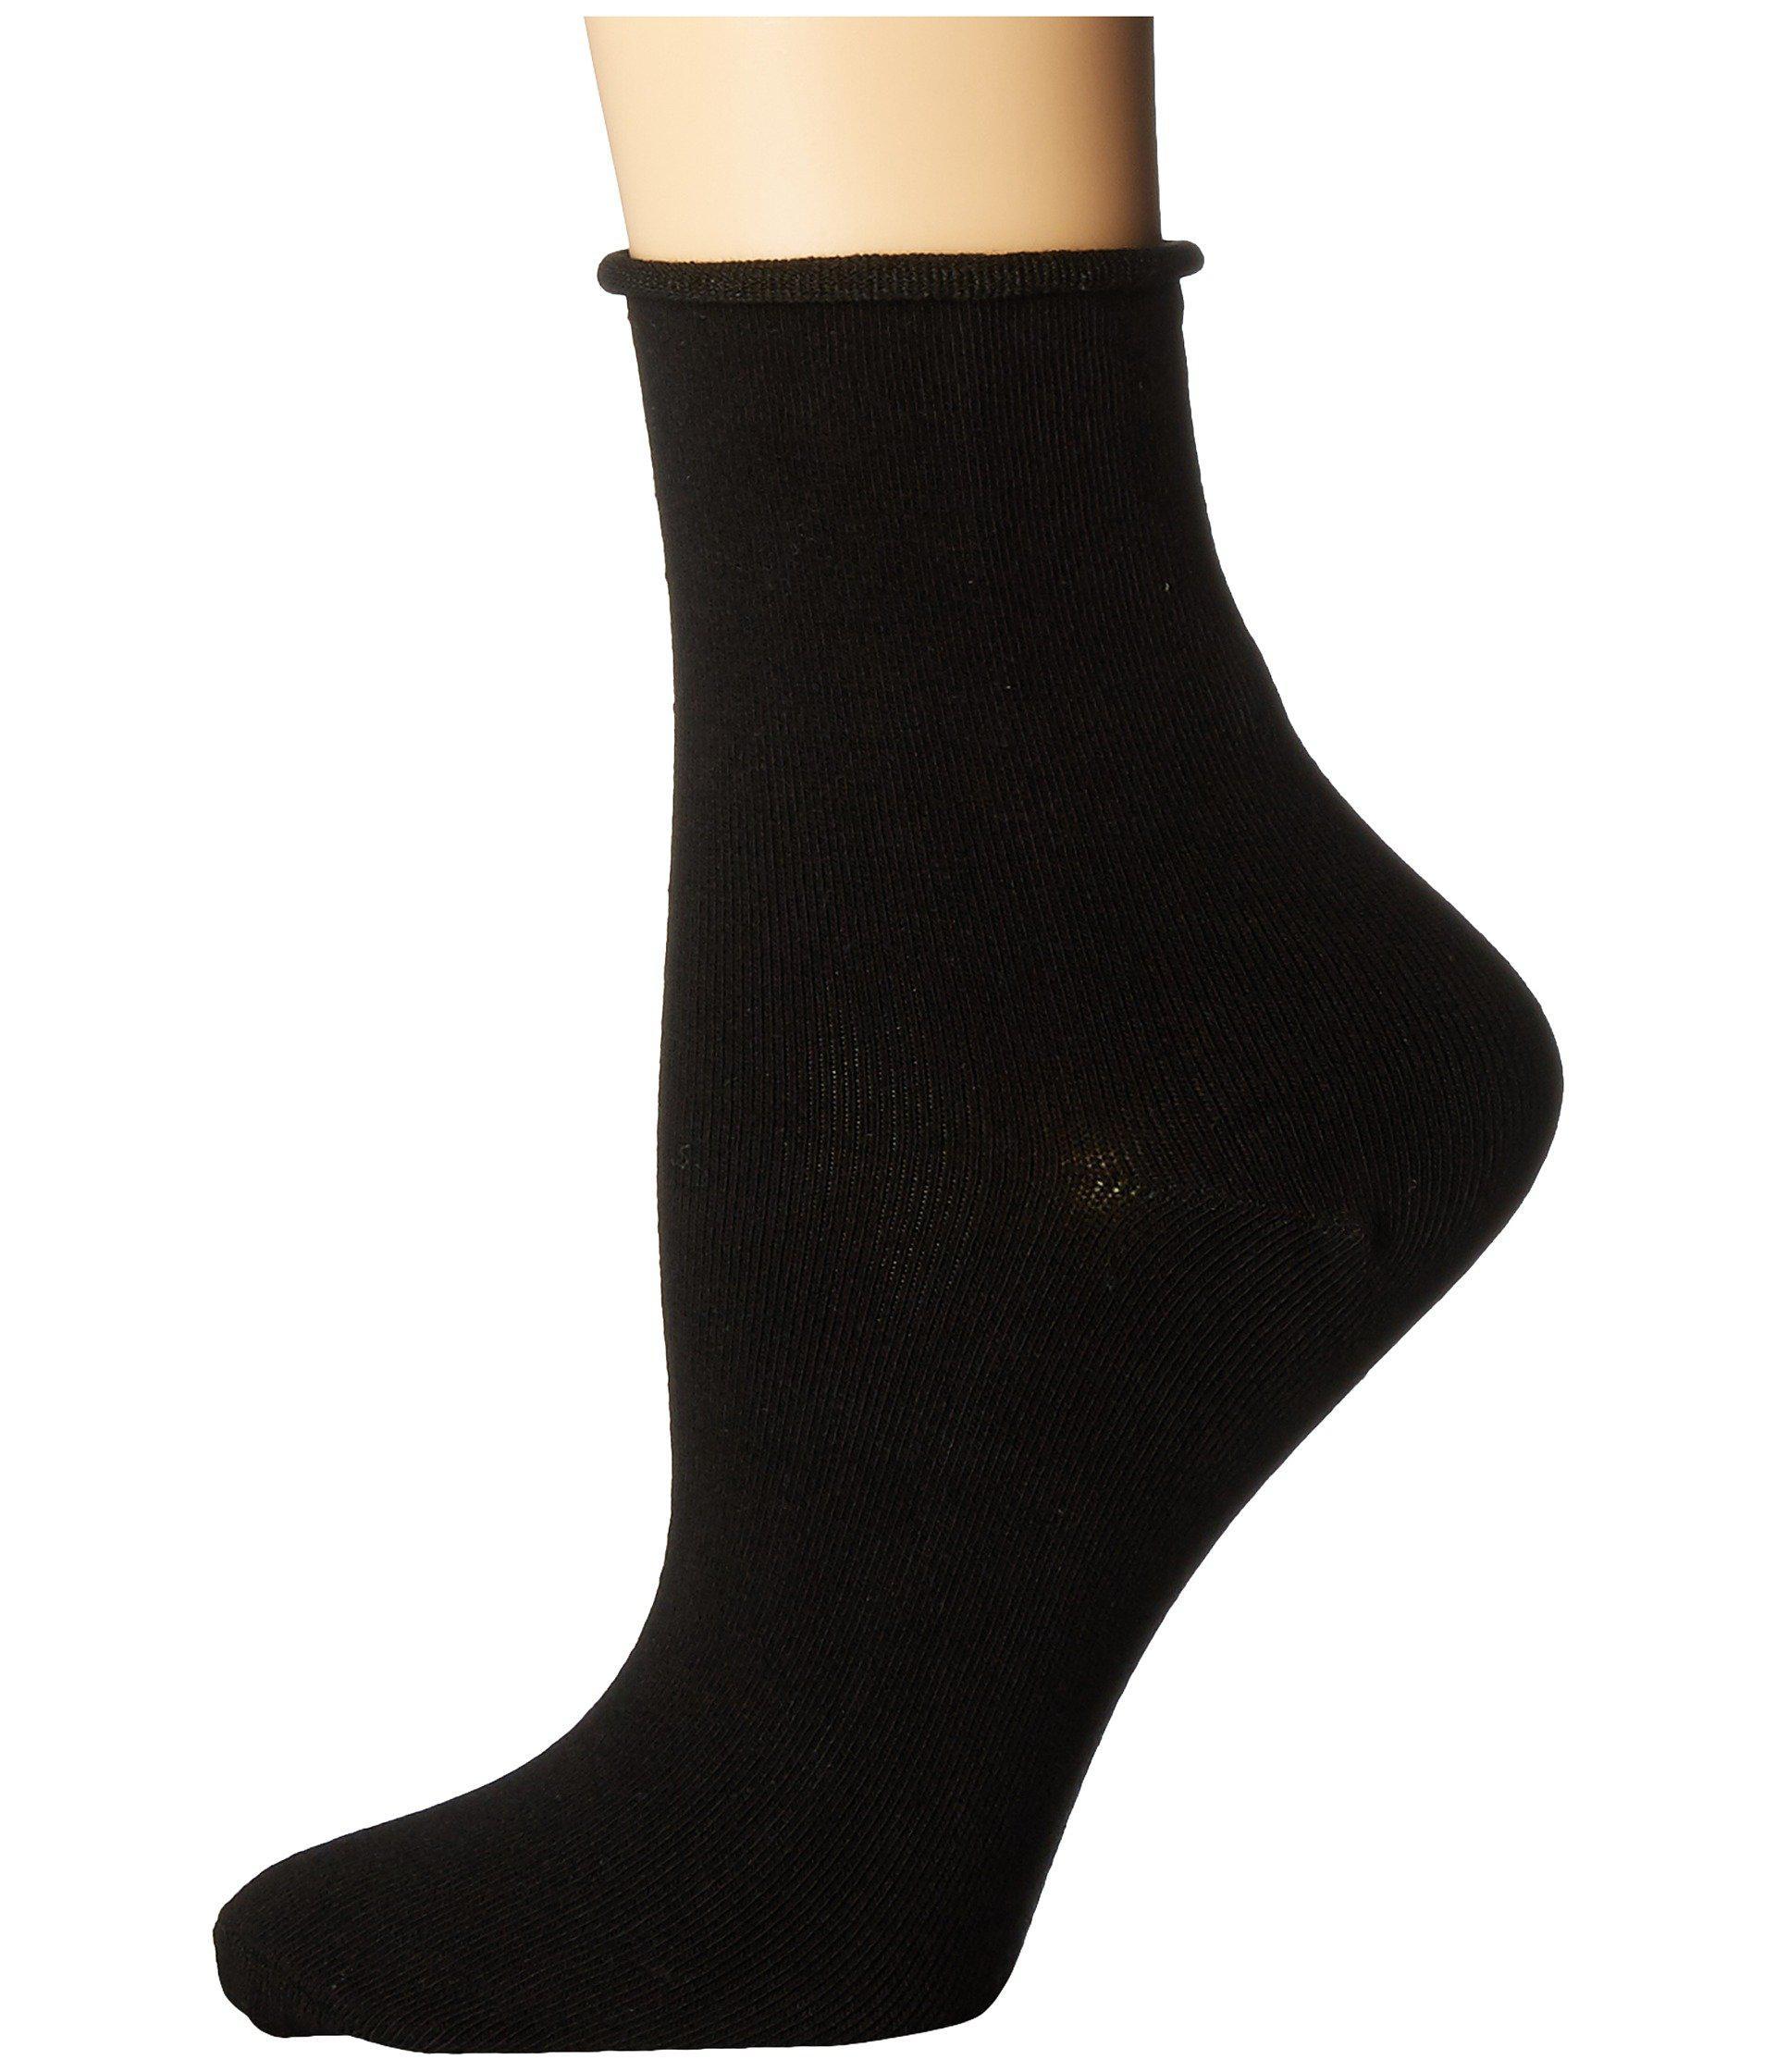 Richer Poorer Cotton Jane Ankle in Black - Lyst